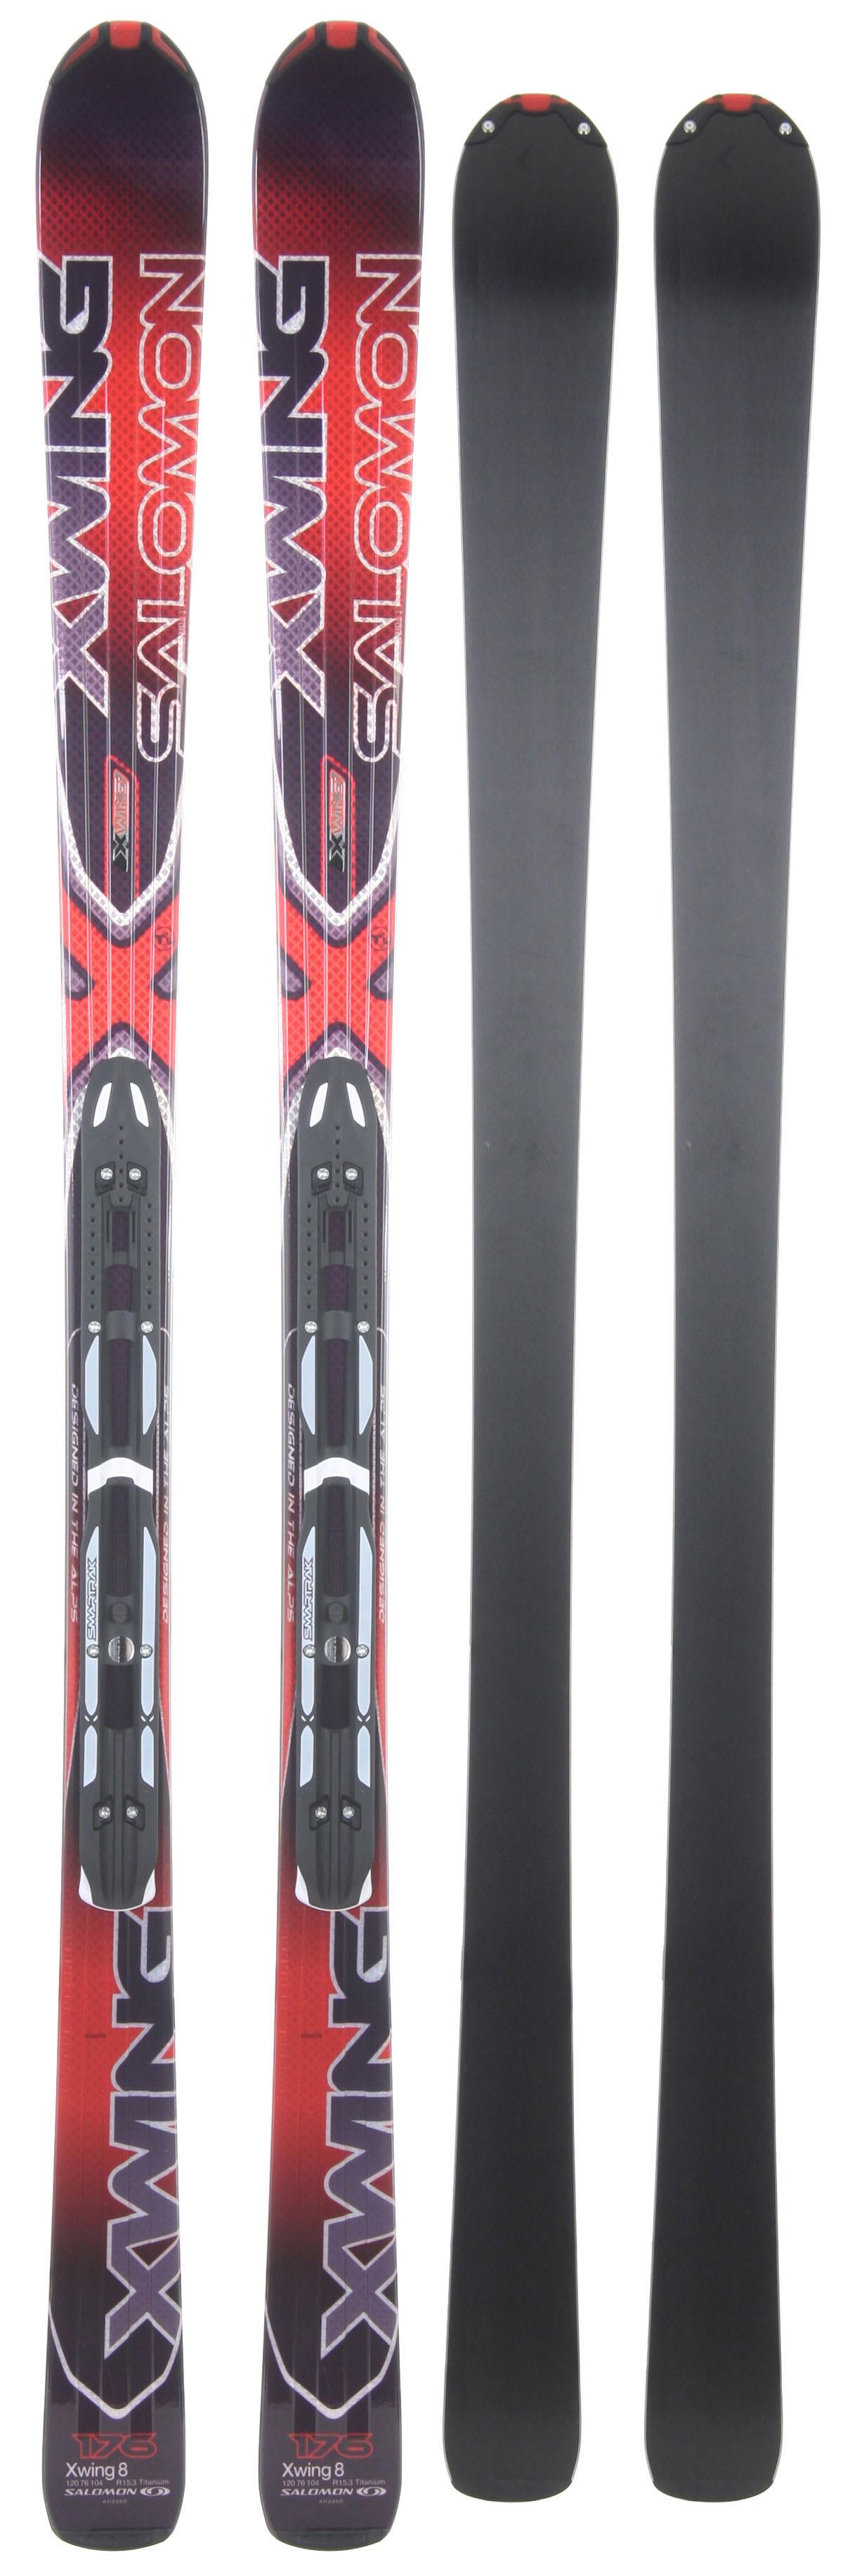 352641d0f000 Salomon X Wing 8 Skis w  711 Bindings - thumbnail 1